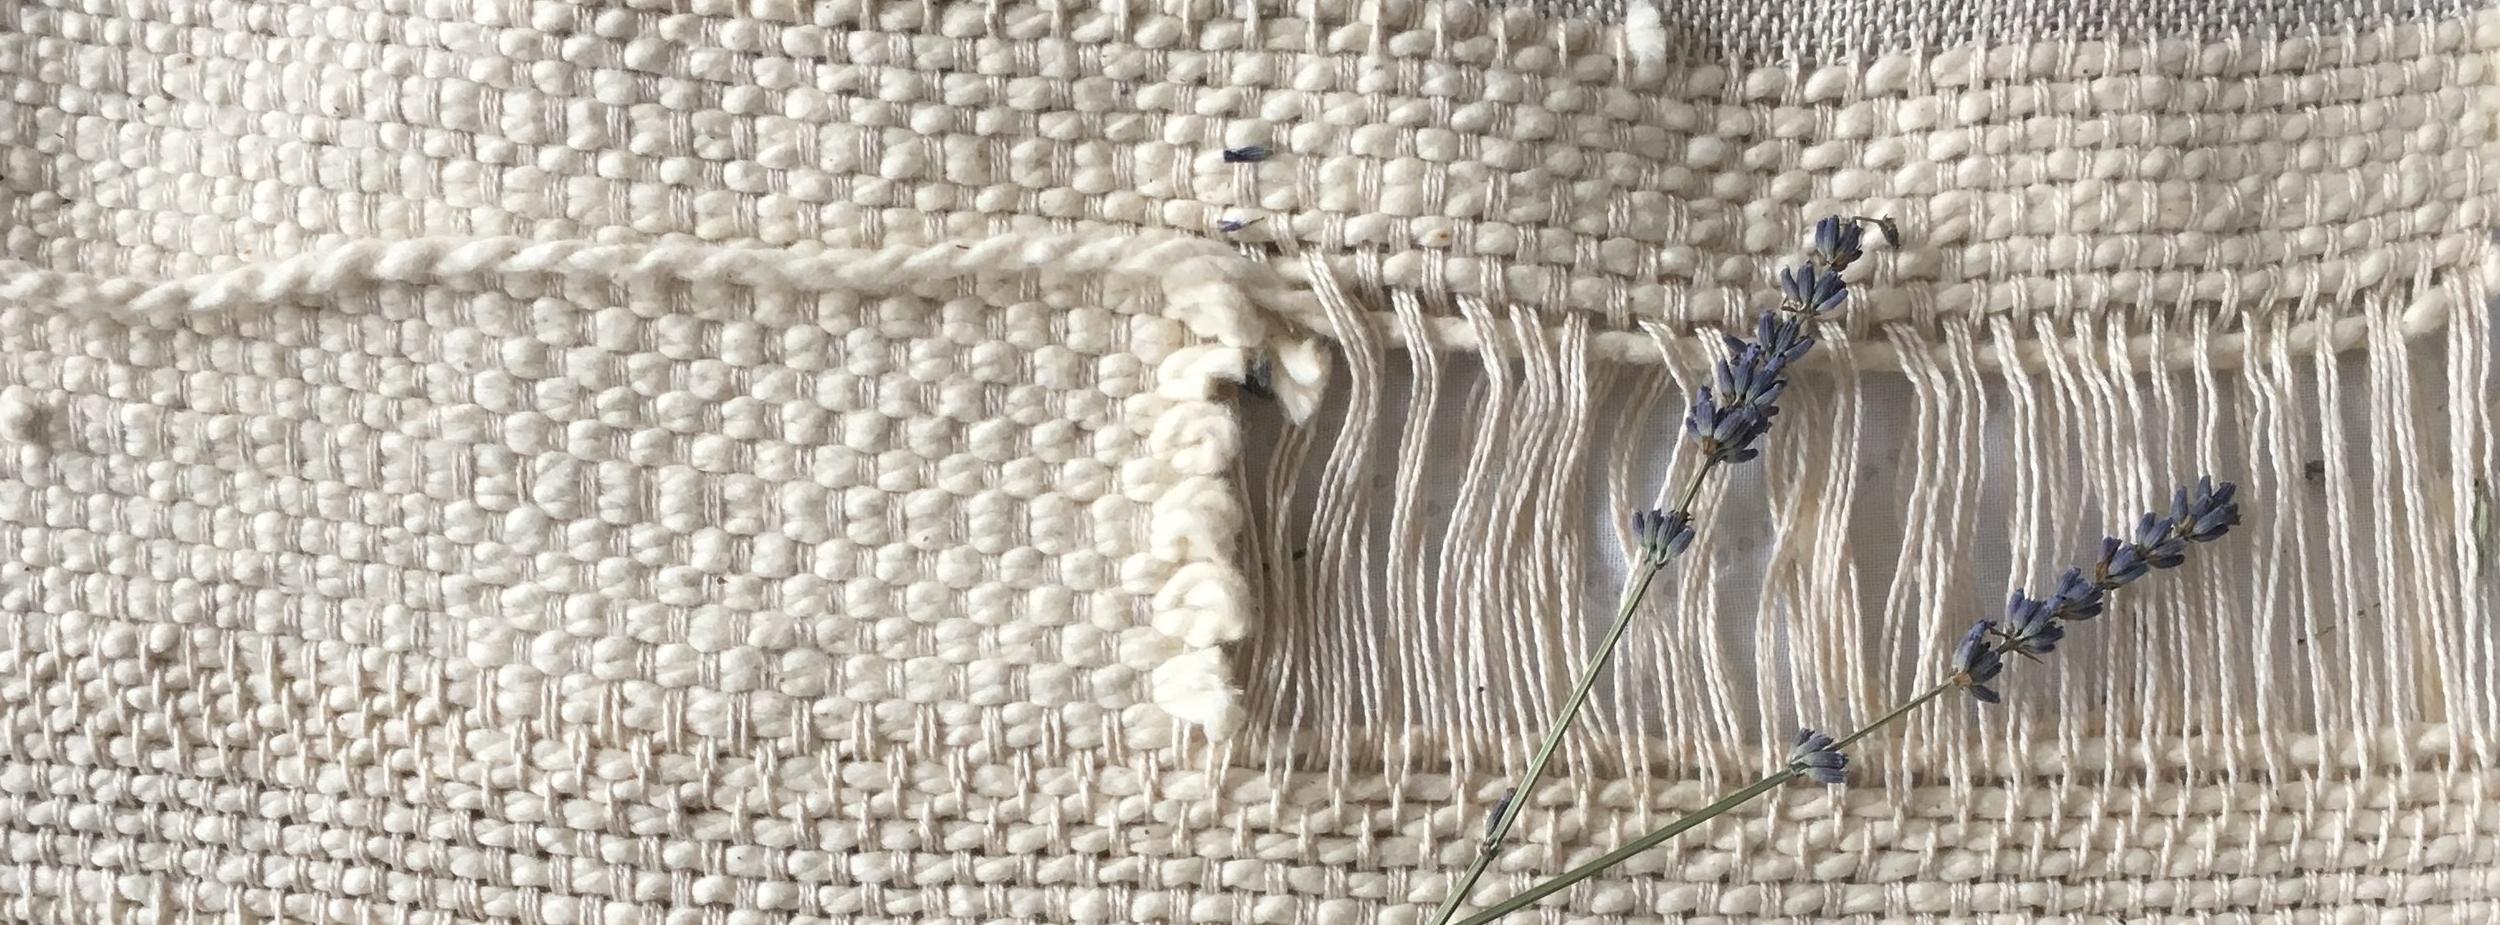 Fabric Sample Created by Sarah Epstein 2017